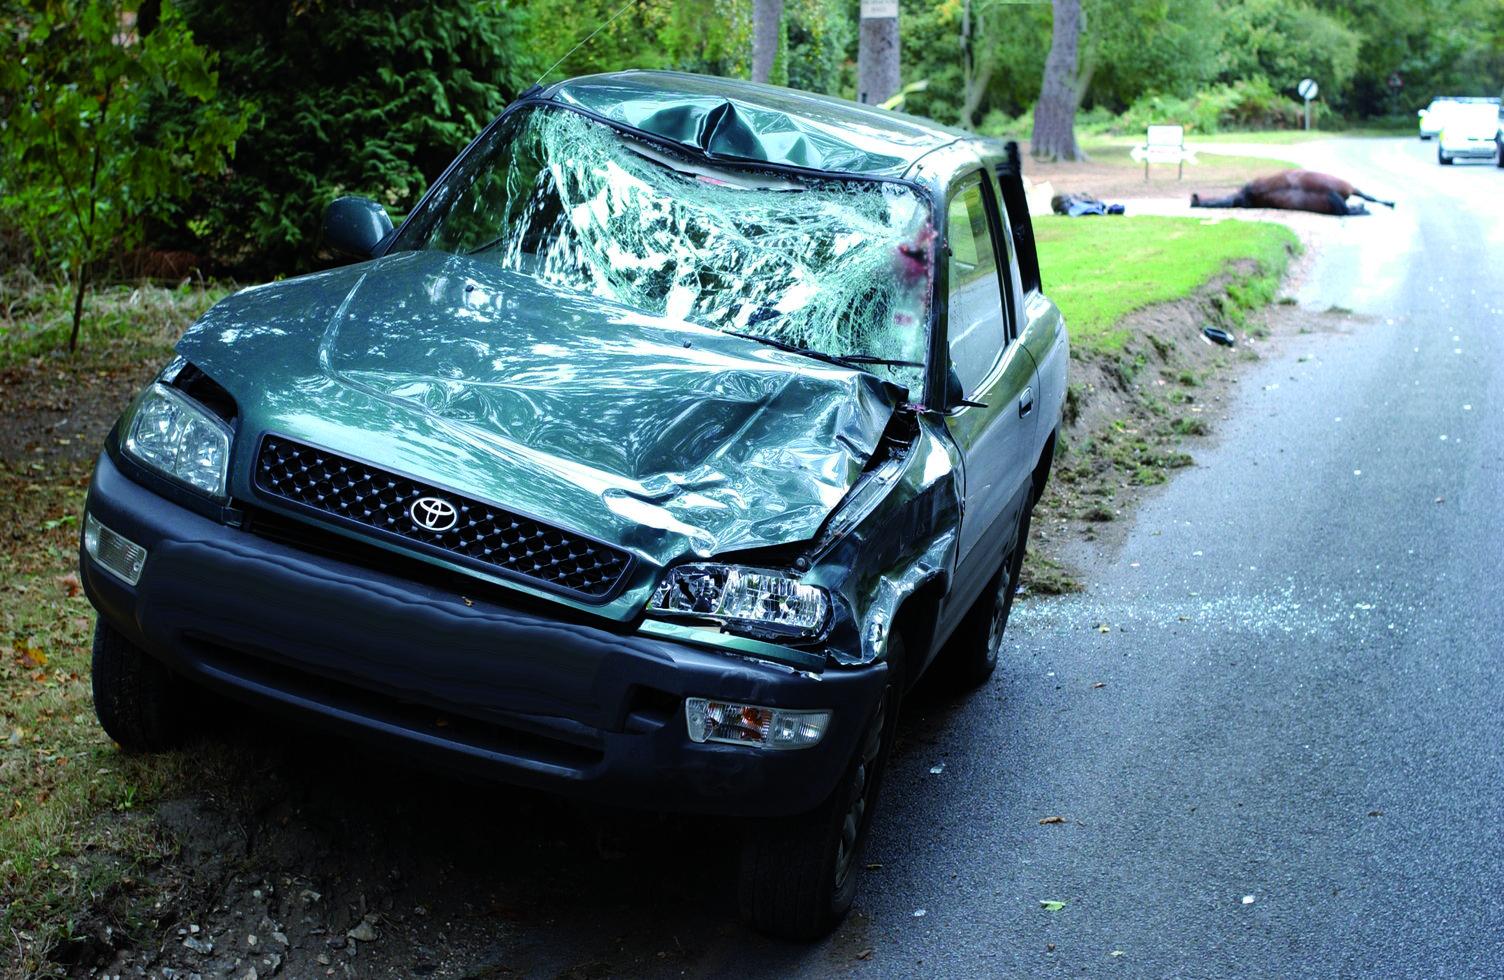 rsz_road_incident_c_bhs